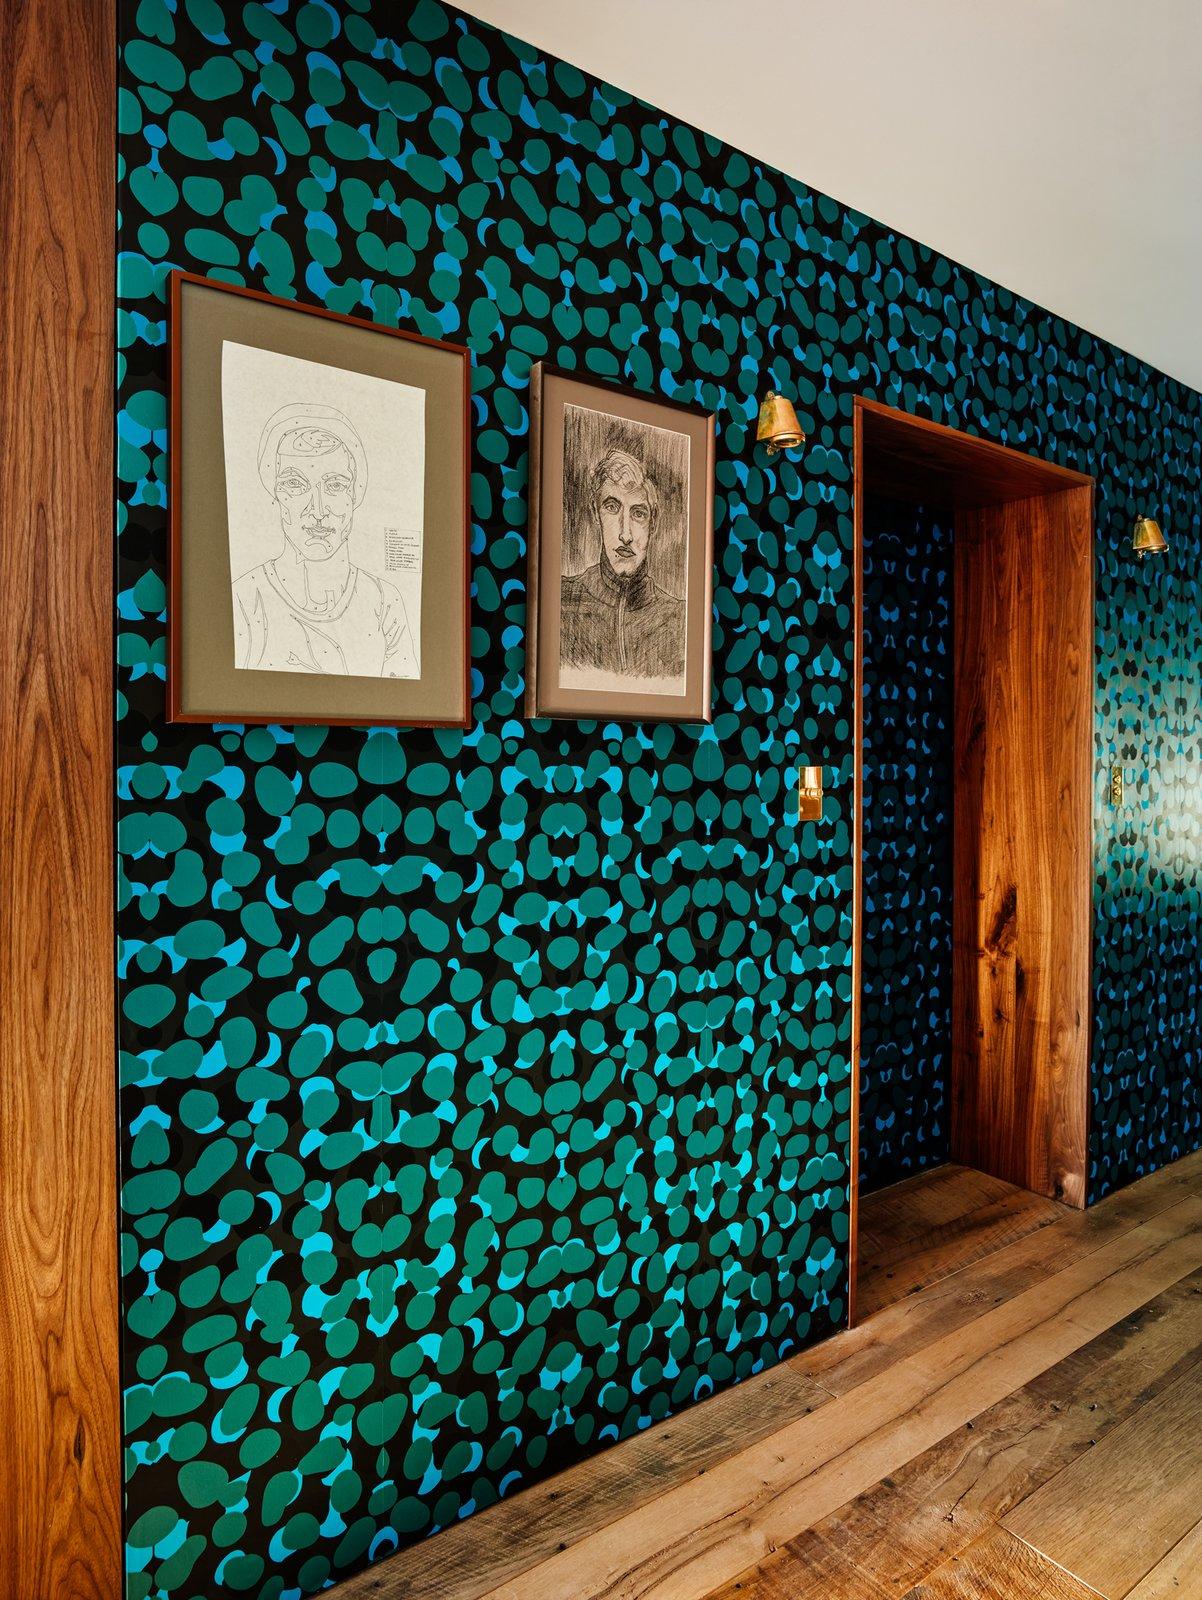 Wallpaper That Fixes Walls Dwell